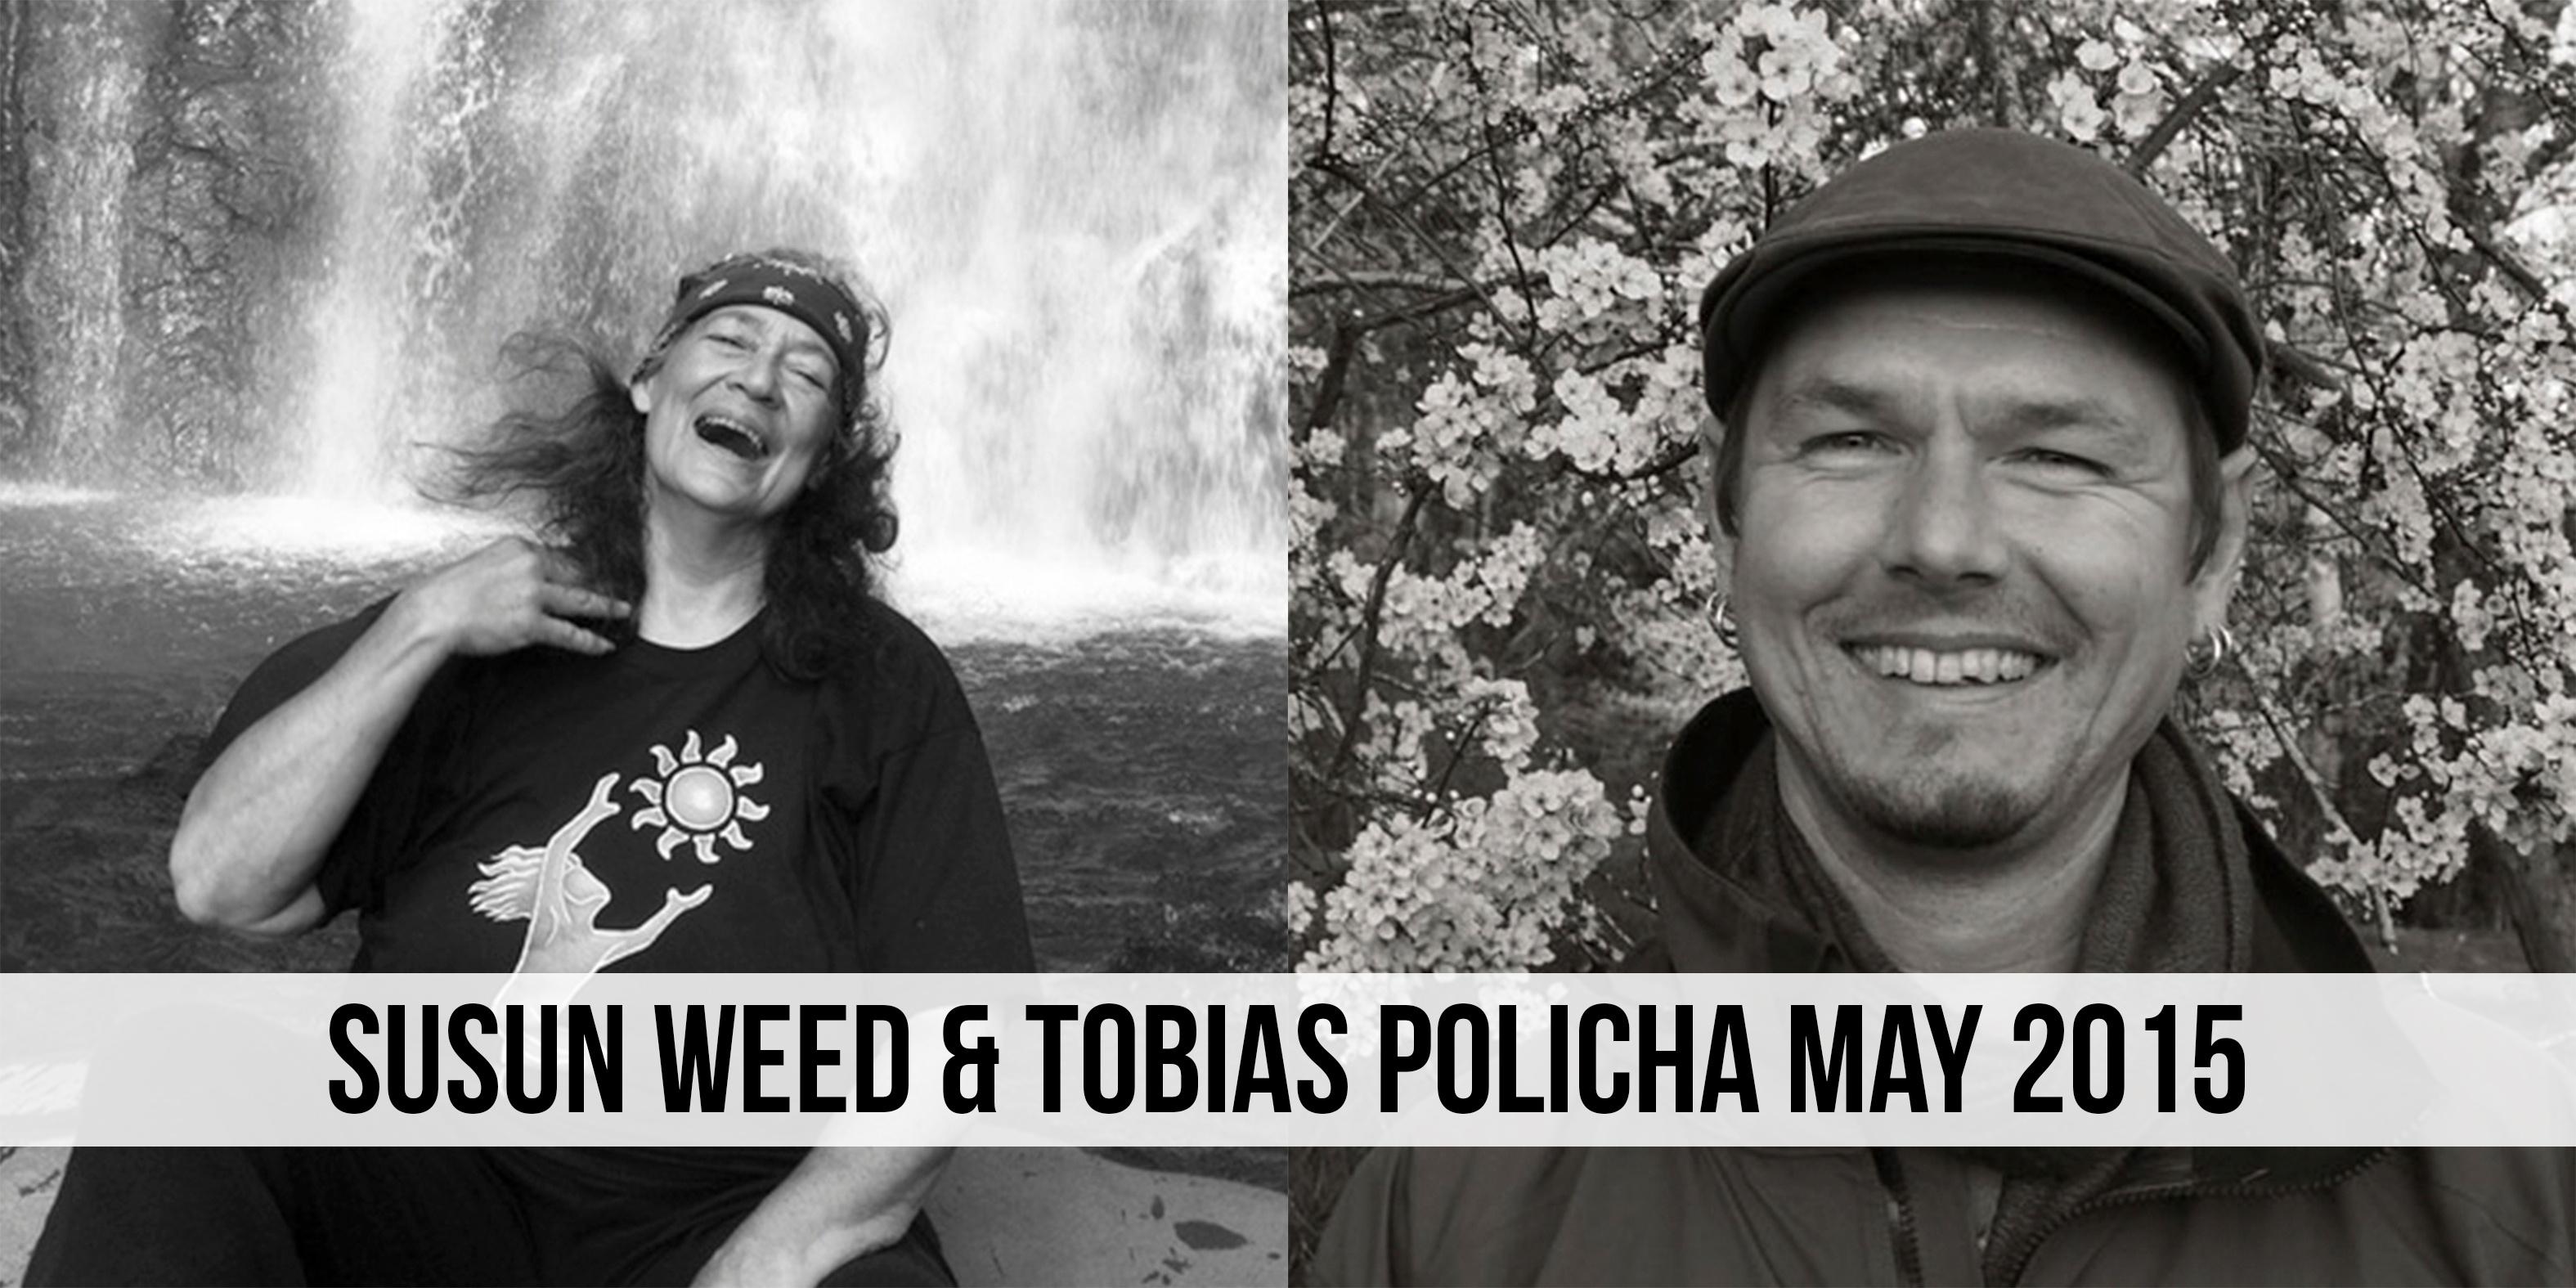 Susan Weed and Tobias Policha